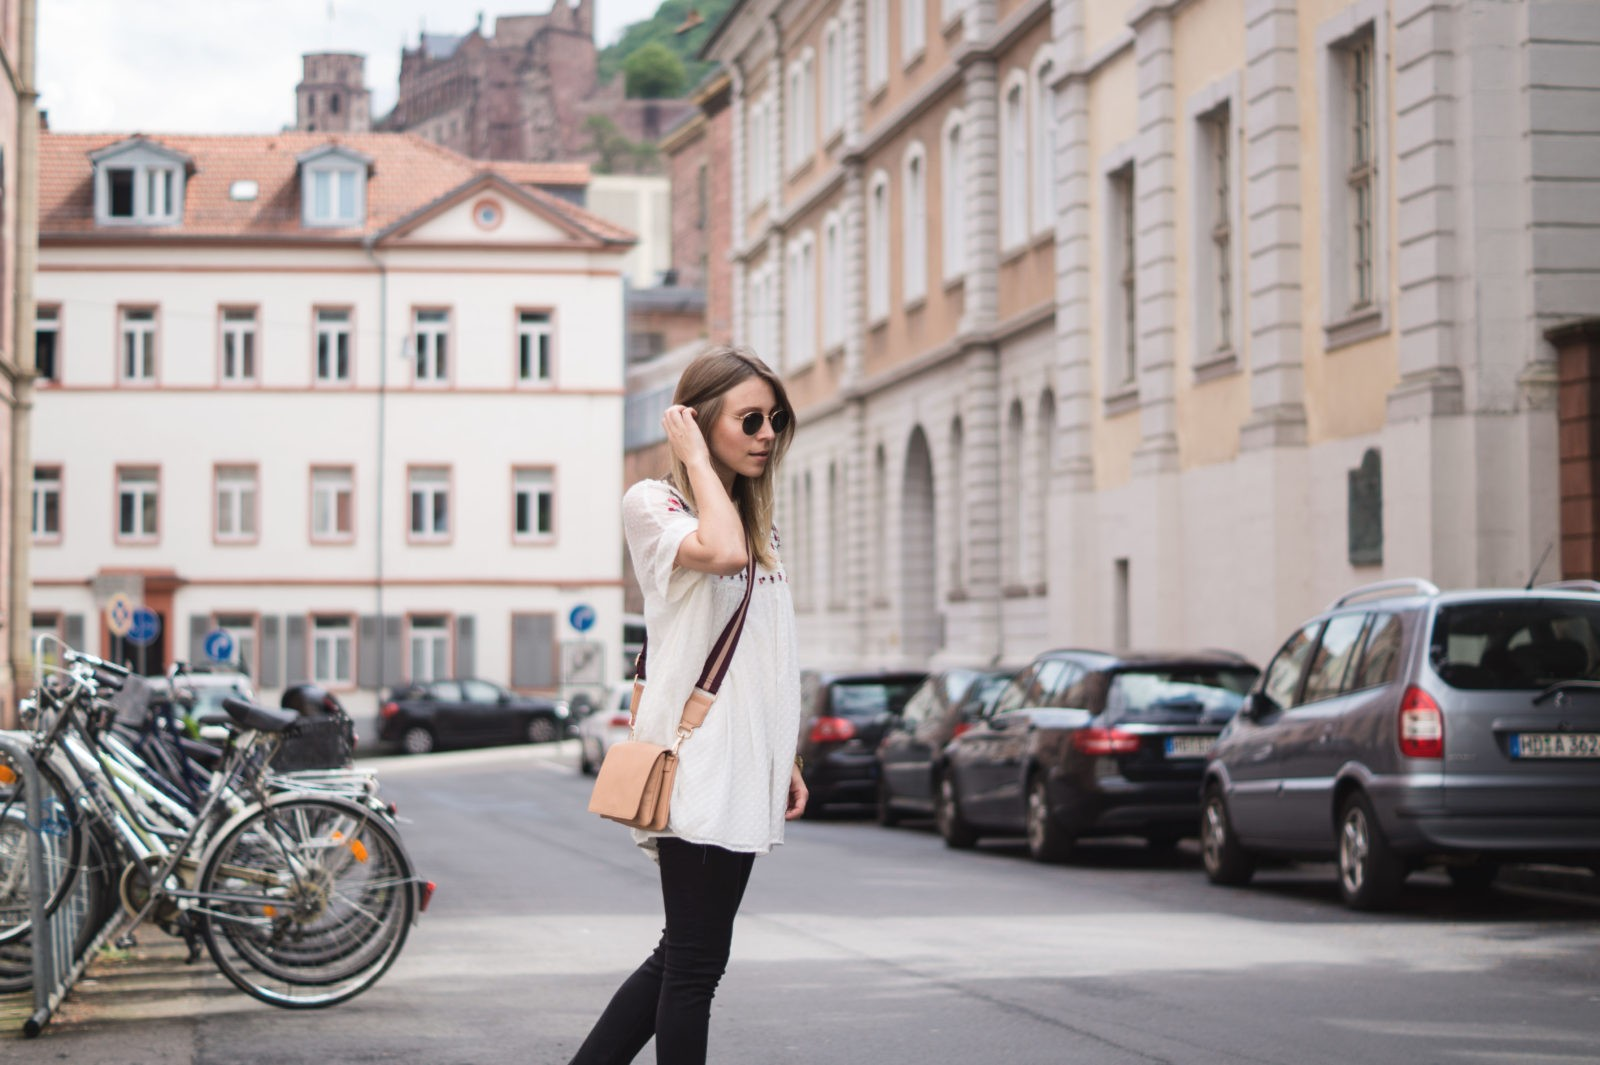 Floral Summer Dress Zara Jumpsuit Black Loafers Pantoletten Sommerkleid Streetstyle Heidelberg Sariety Modeblog Streetstyle Fashionblogger